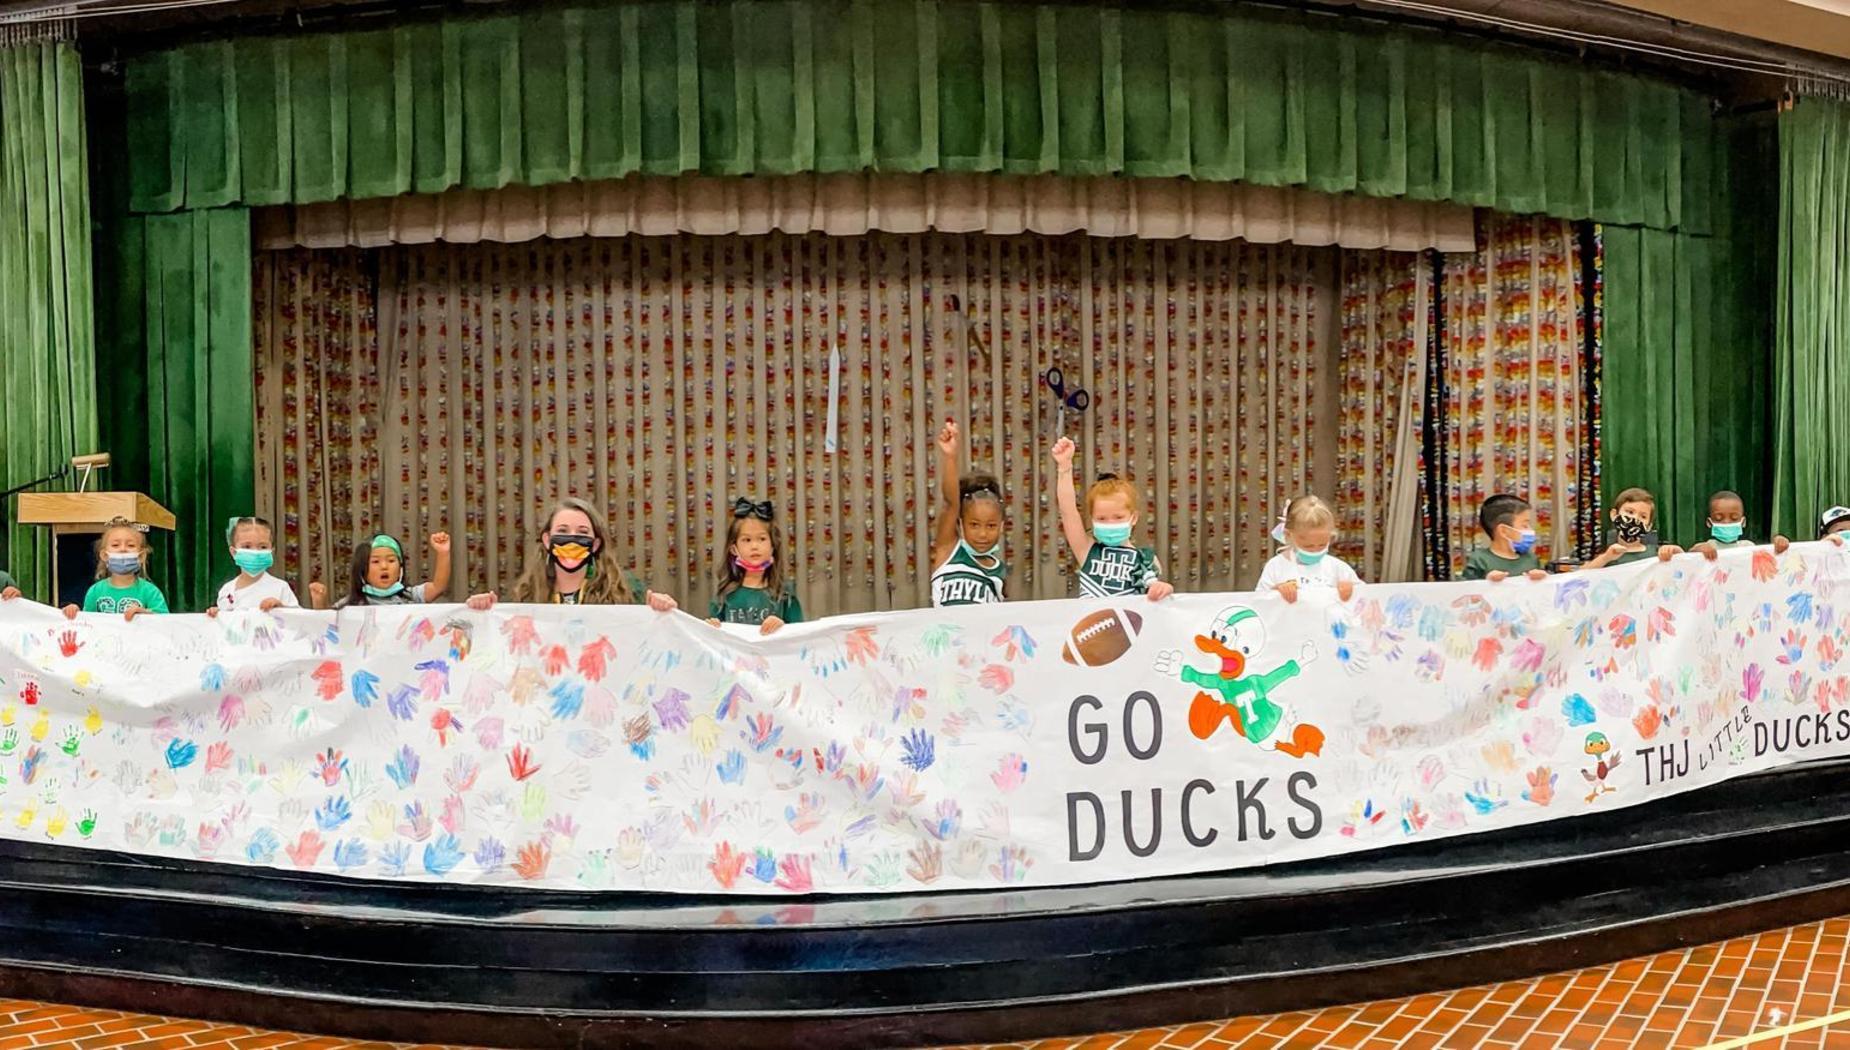 THJ ducks